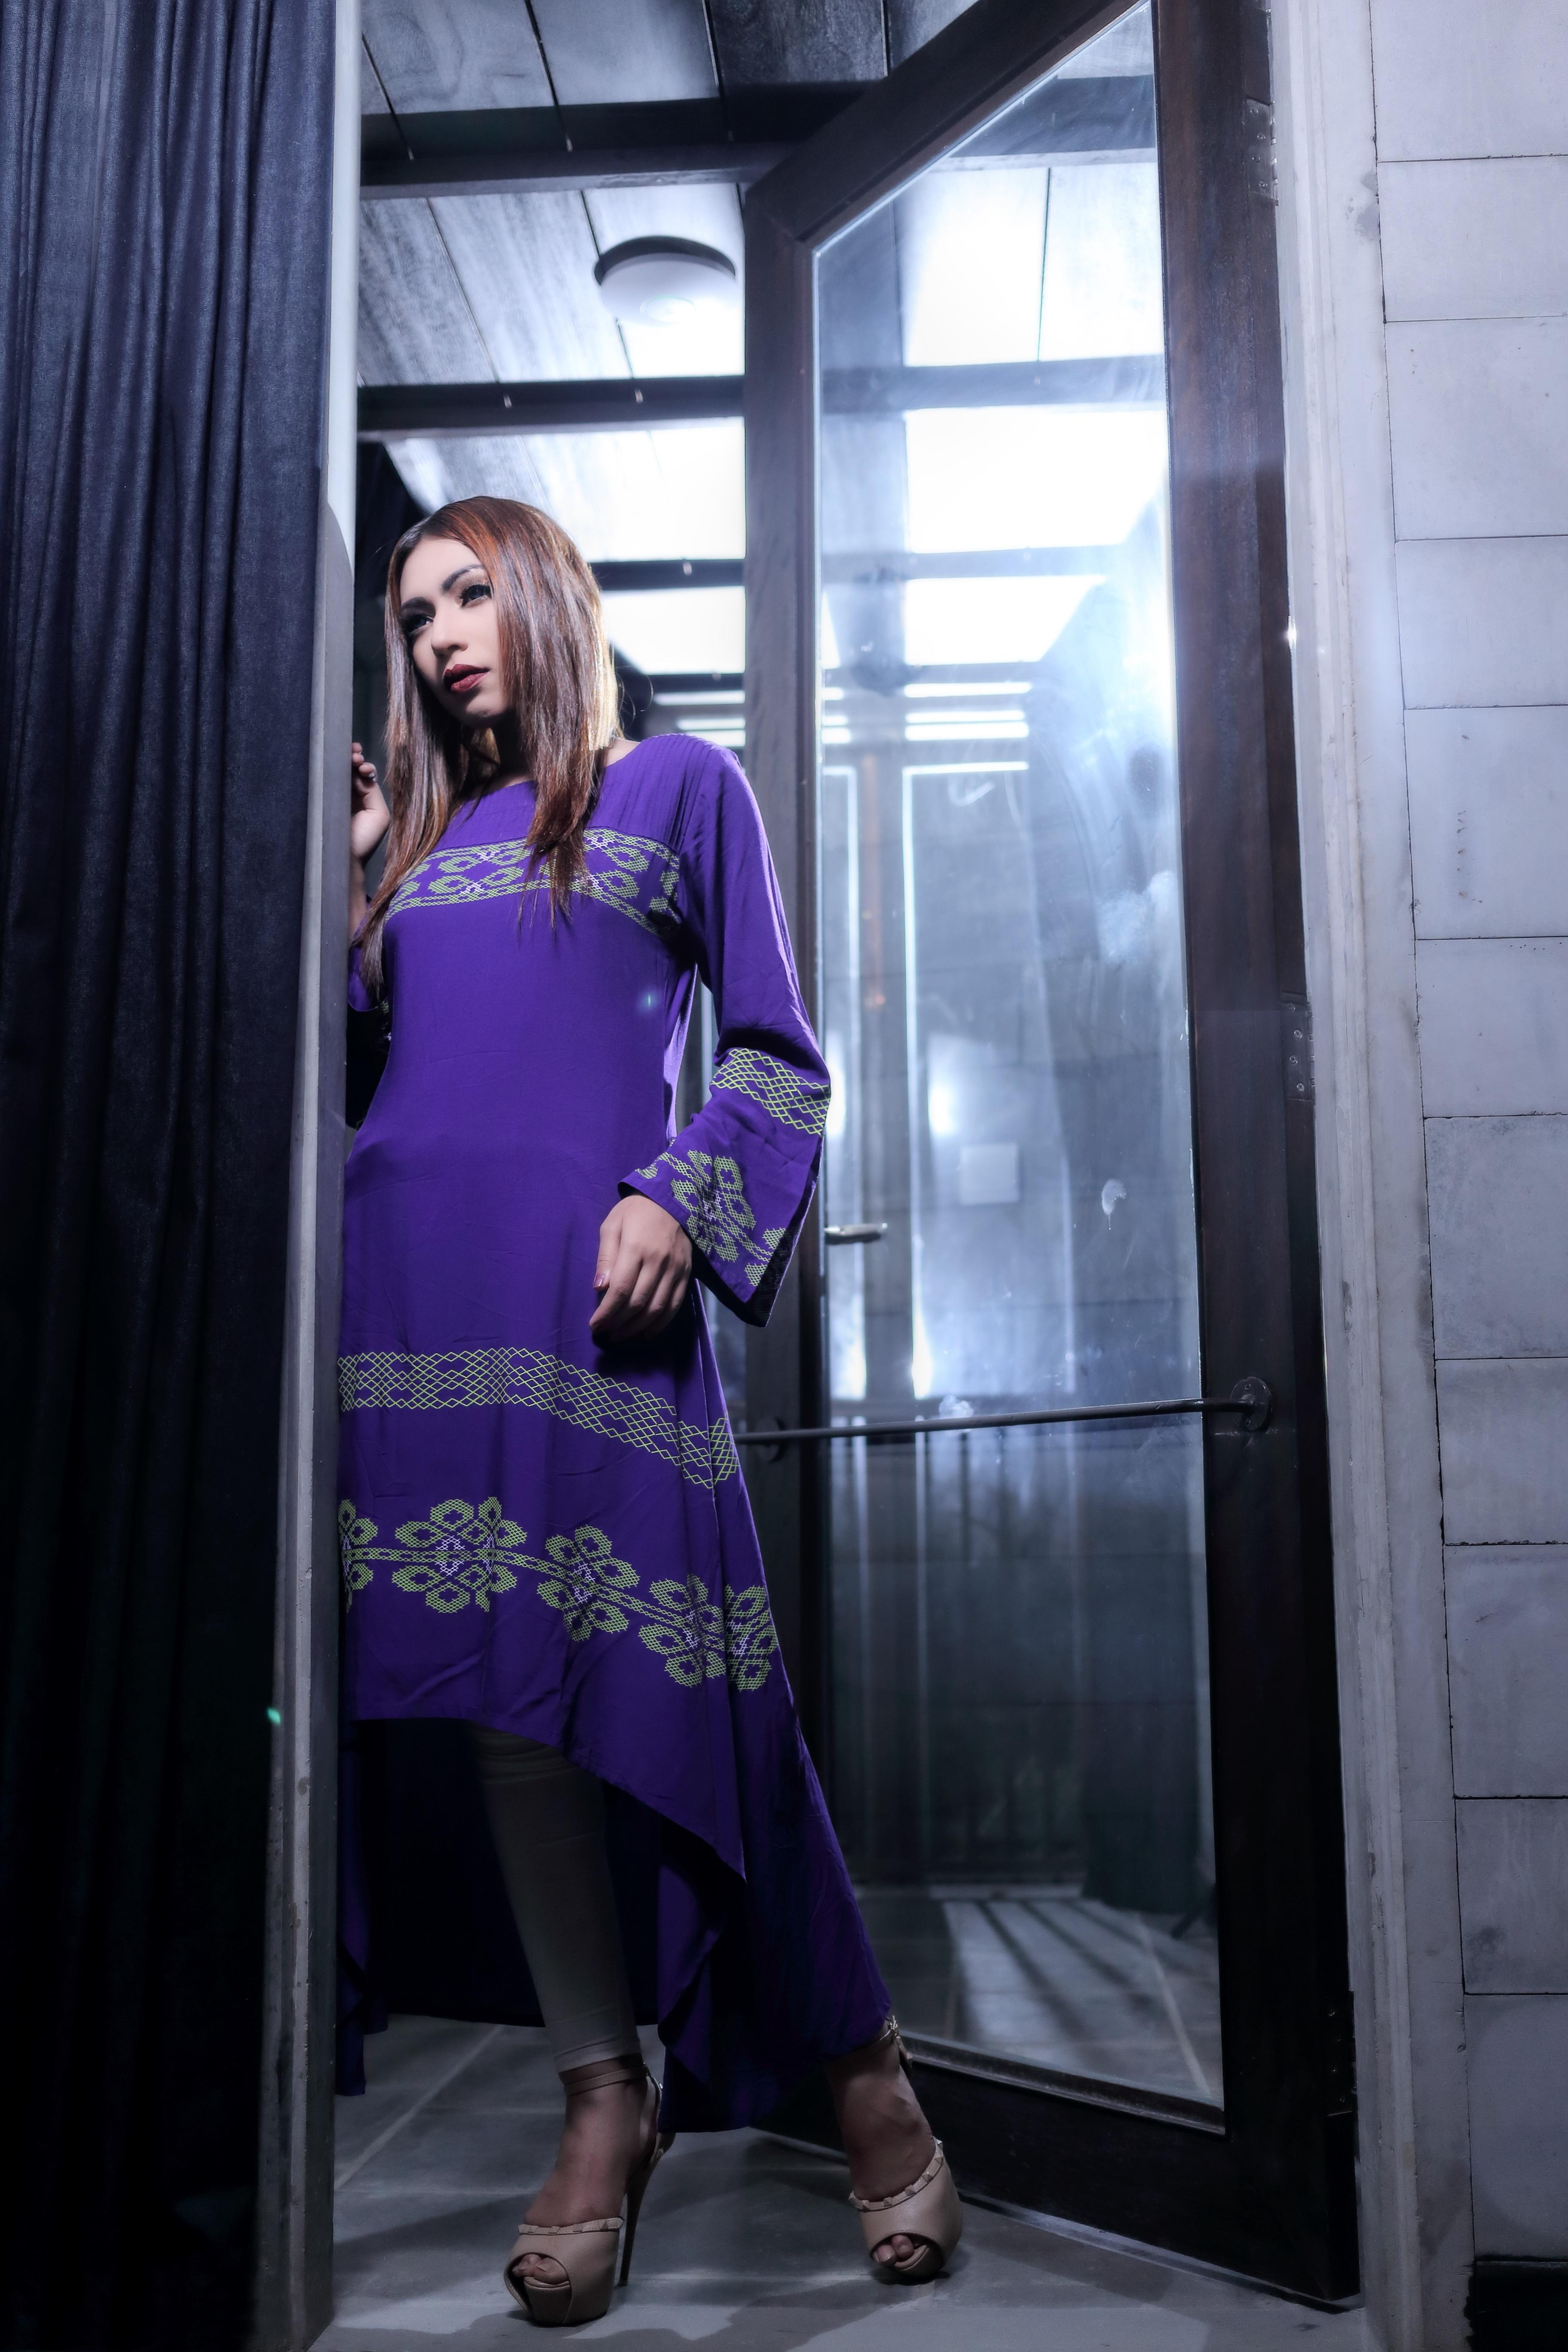 Fotos gratis : mujer, modelo, primavera, color, Moda, azul, ropa ...